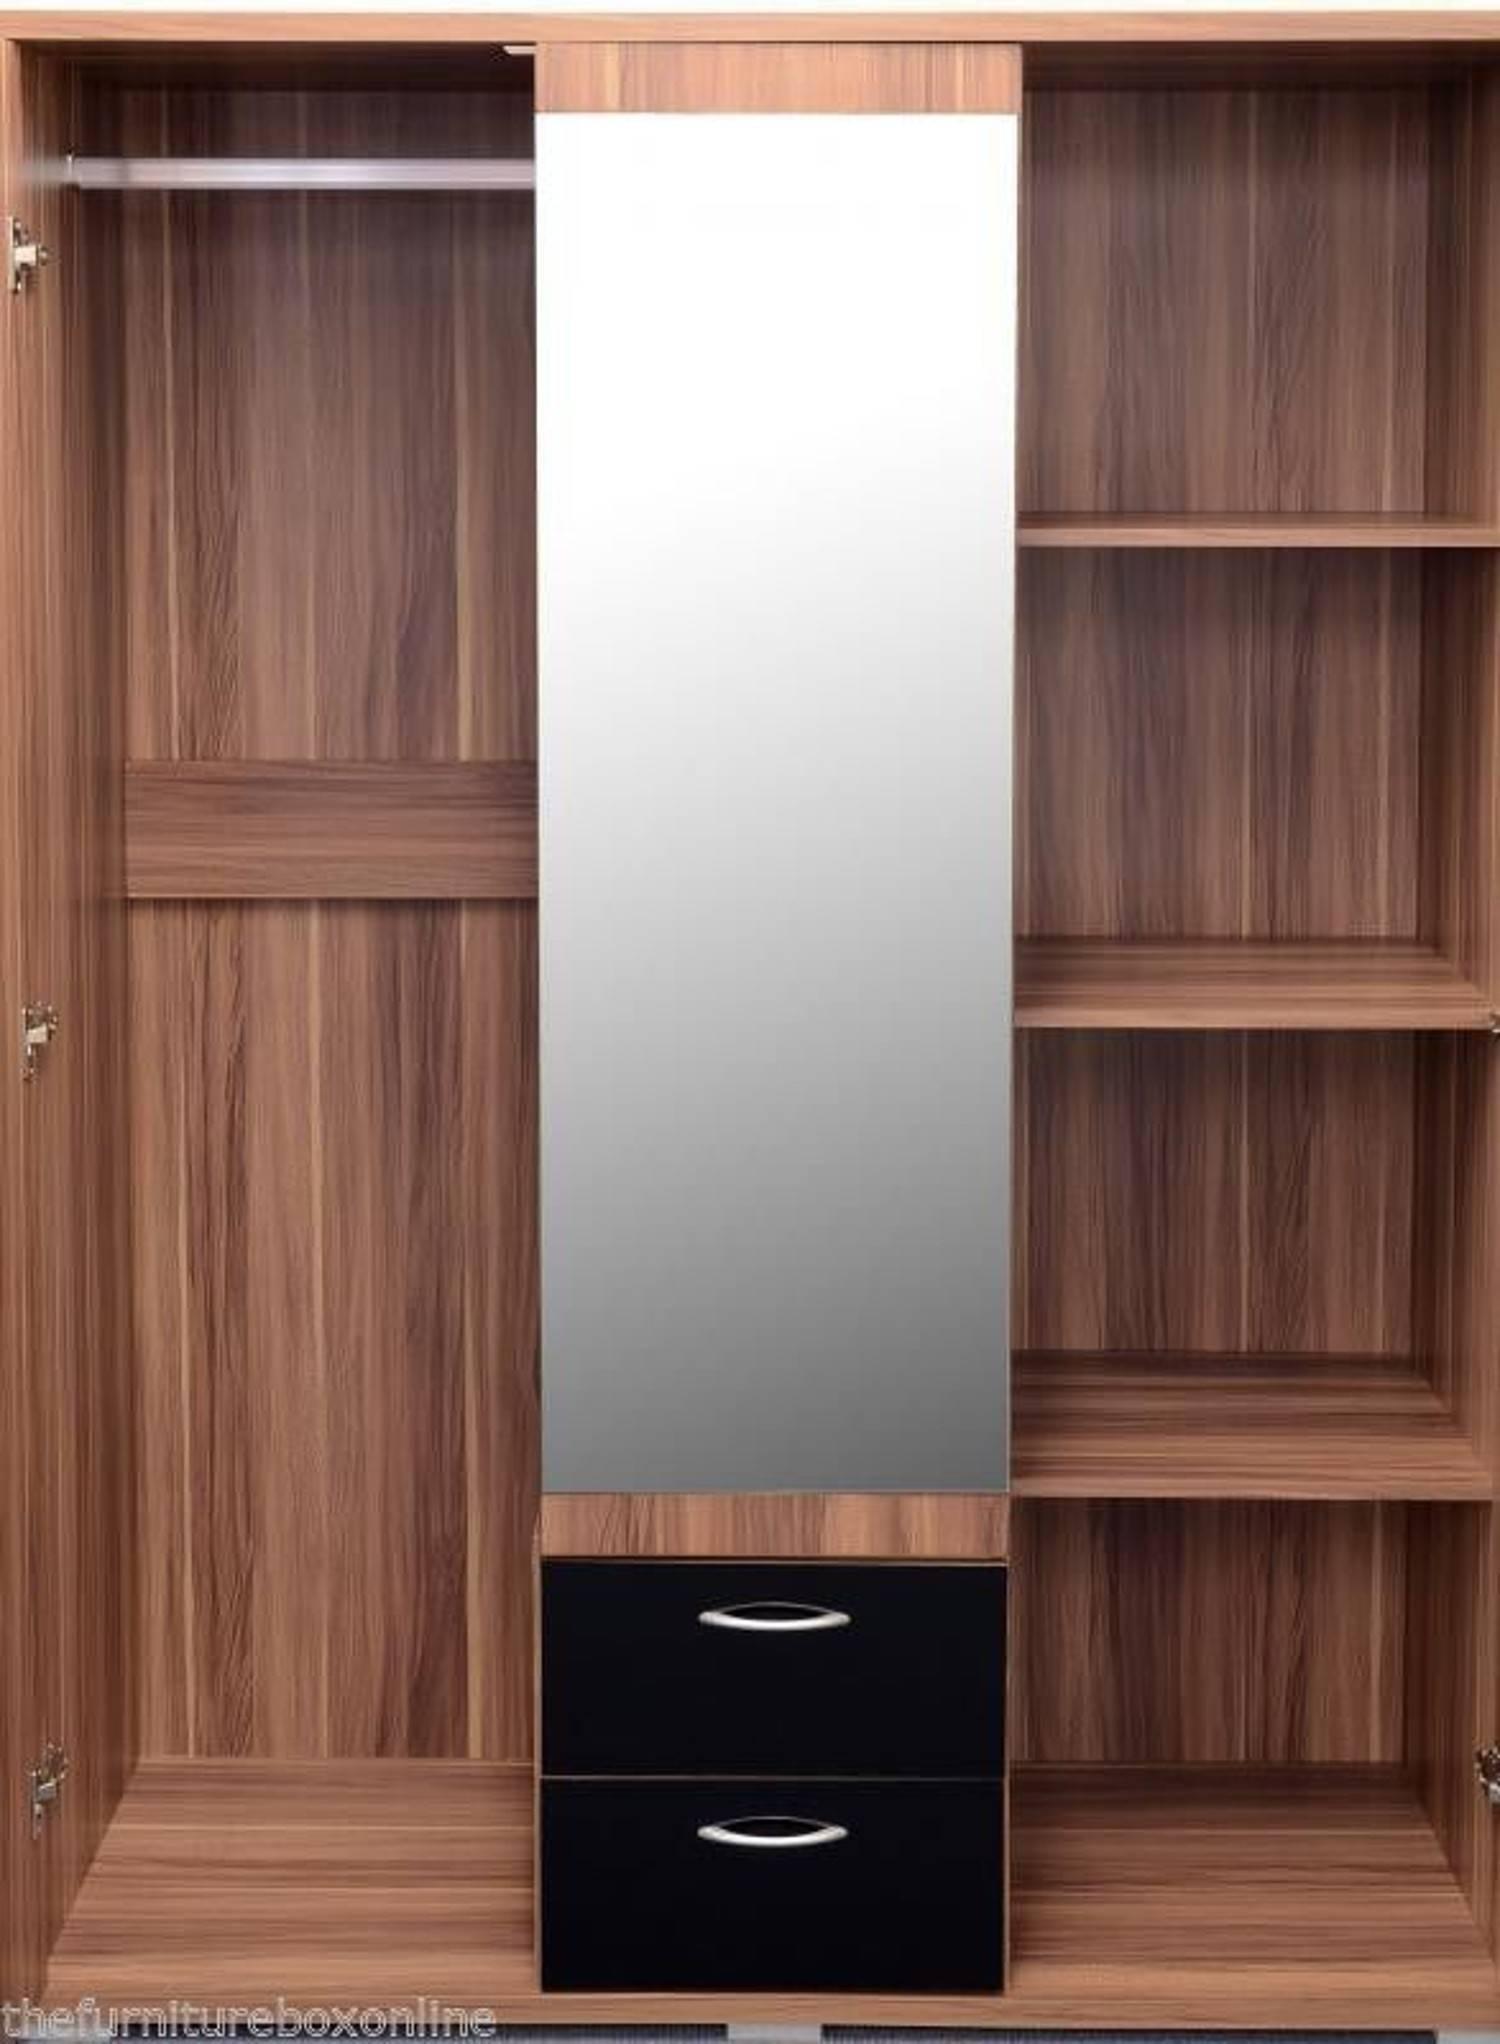 Boston Walnut 3 Door 2 Drawer Mirror Wardrobe | Furniturebox throughout 3 Door Wardrobe With Drawers And Shelves (Image 5 of 30)